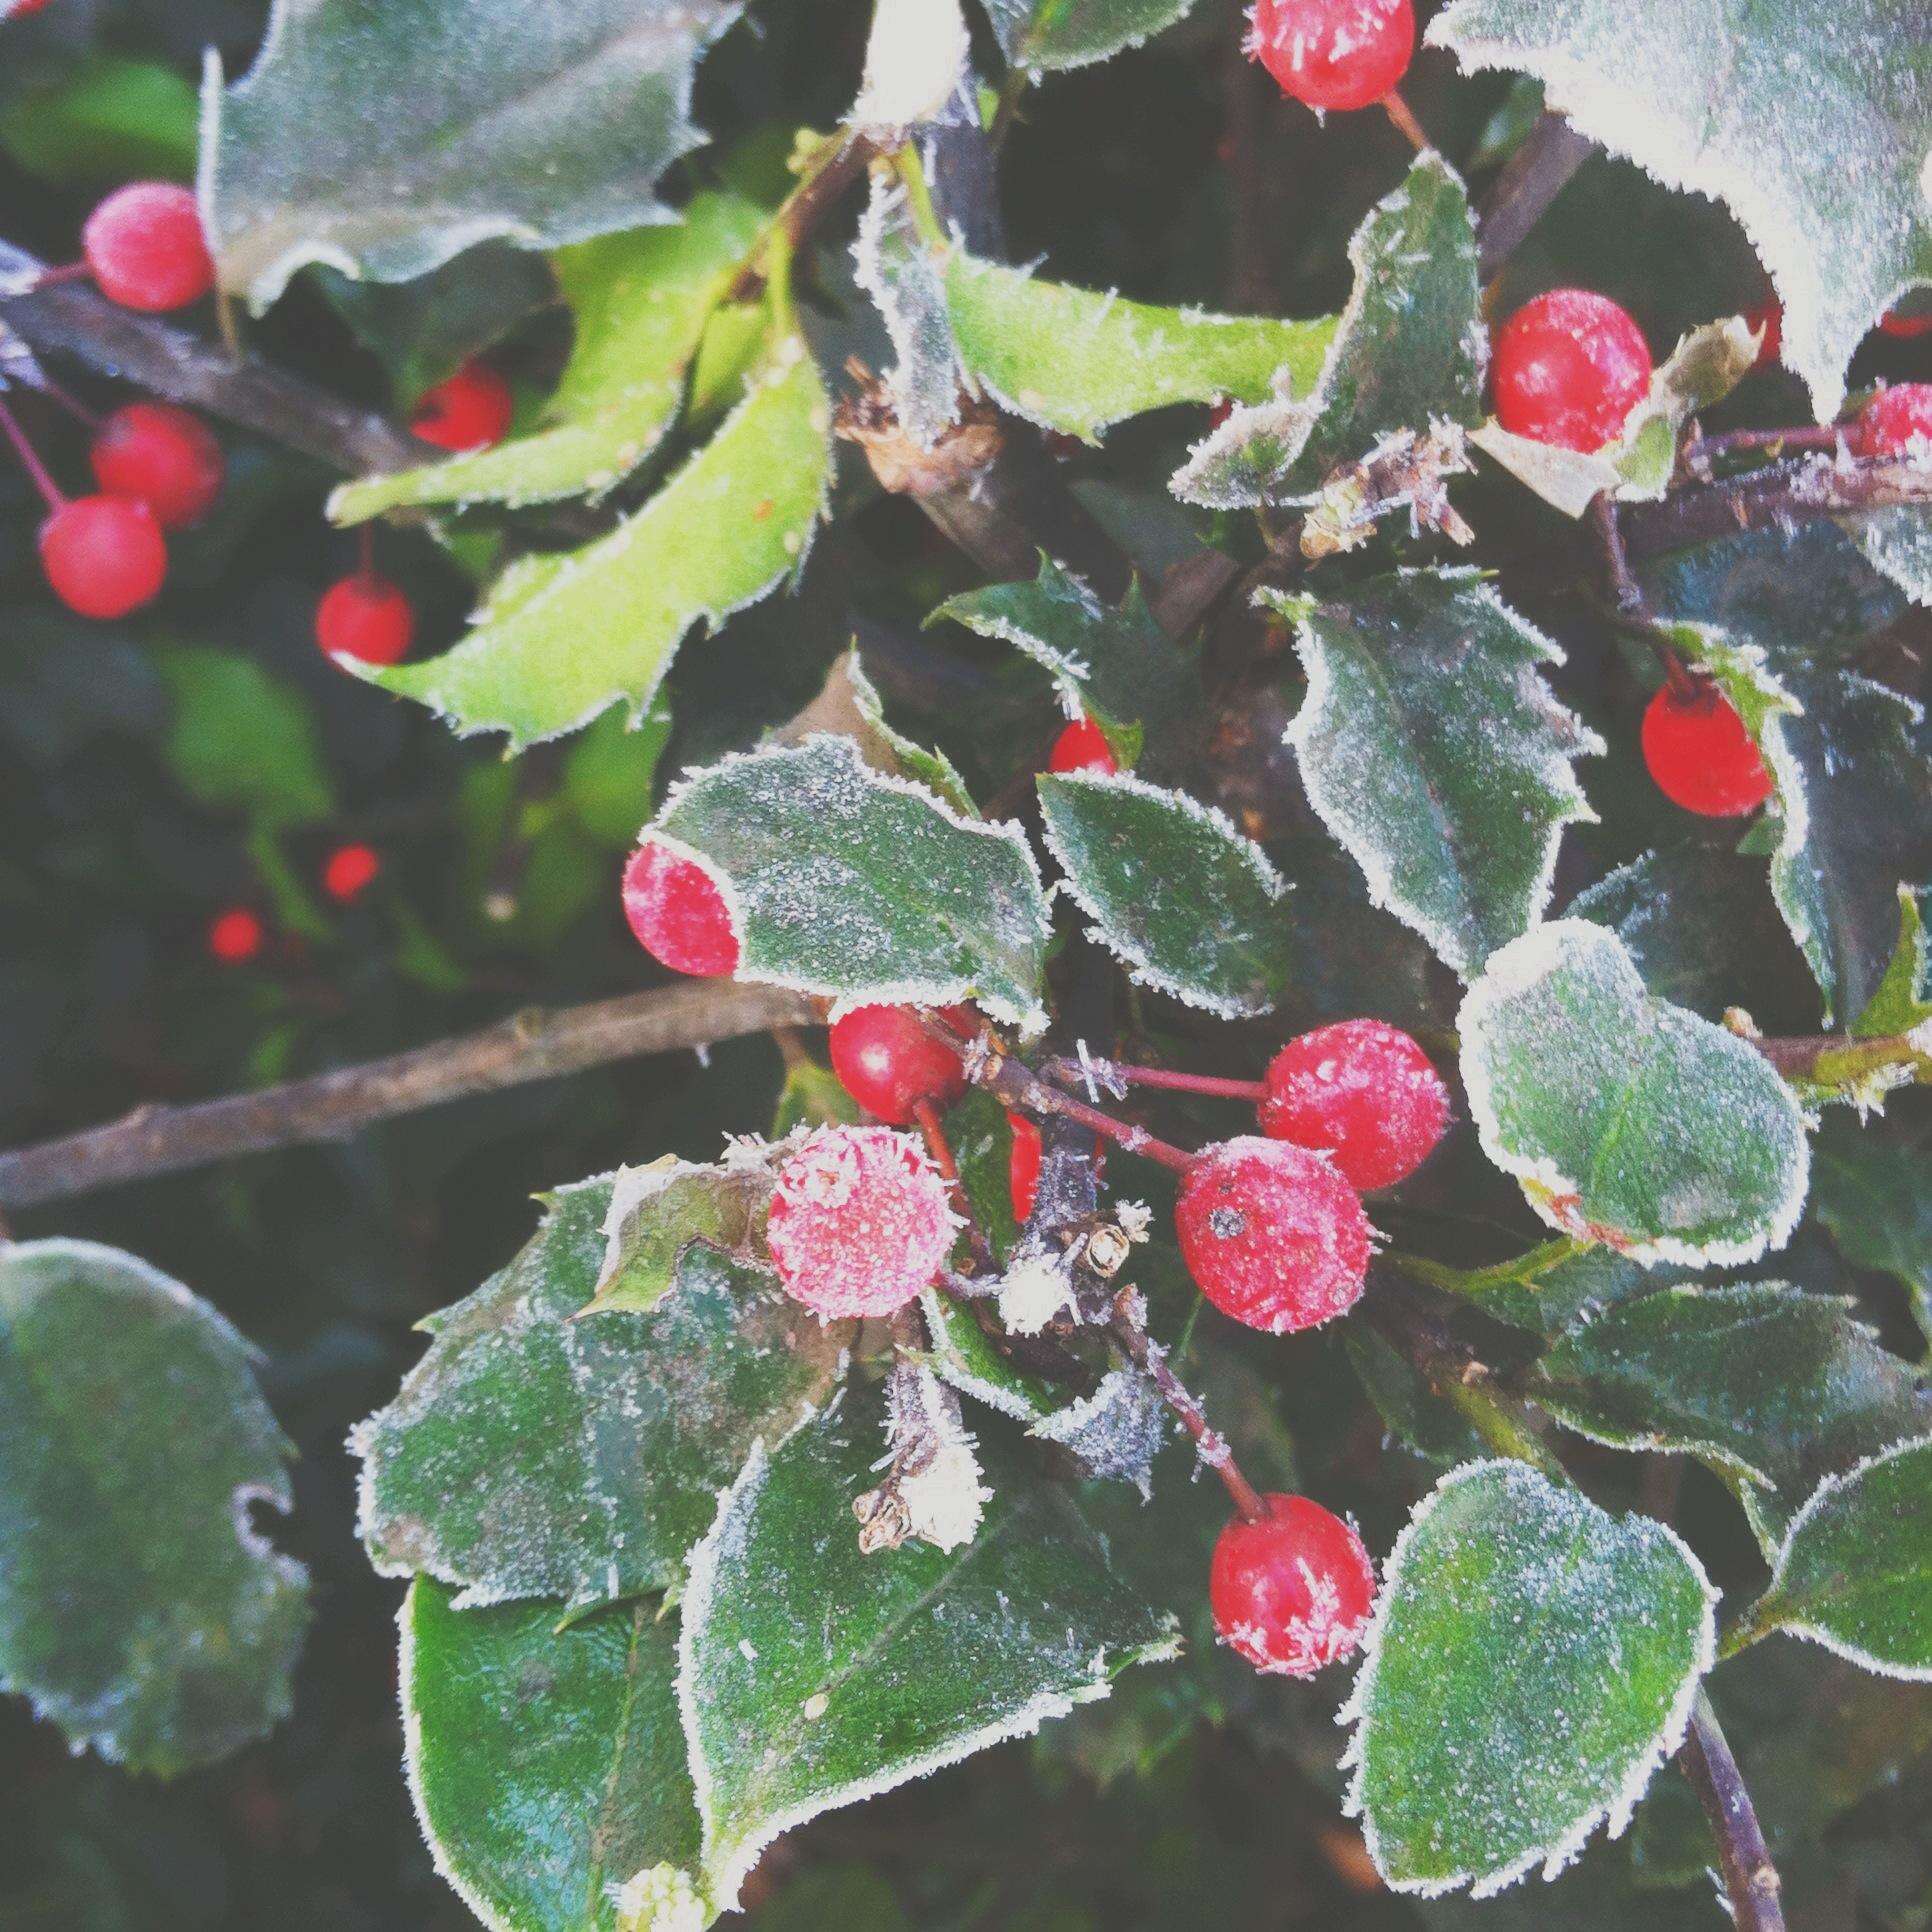 Snowy Blurry Christmas